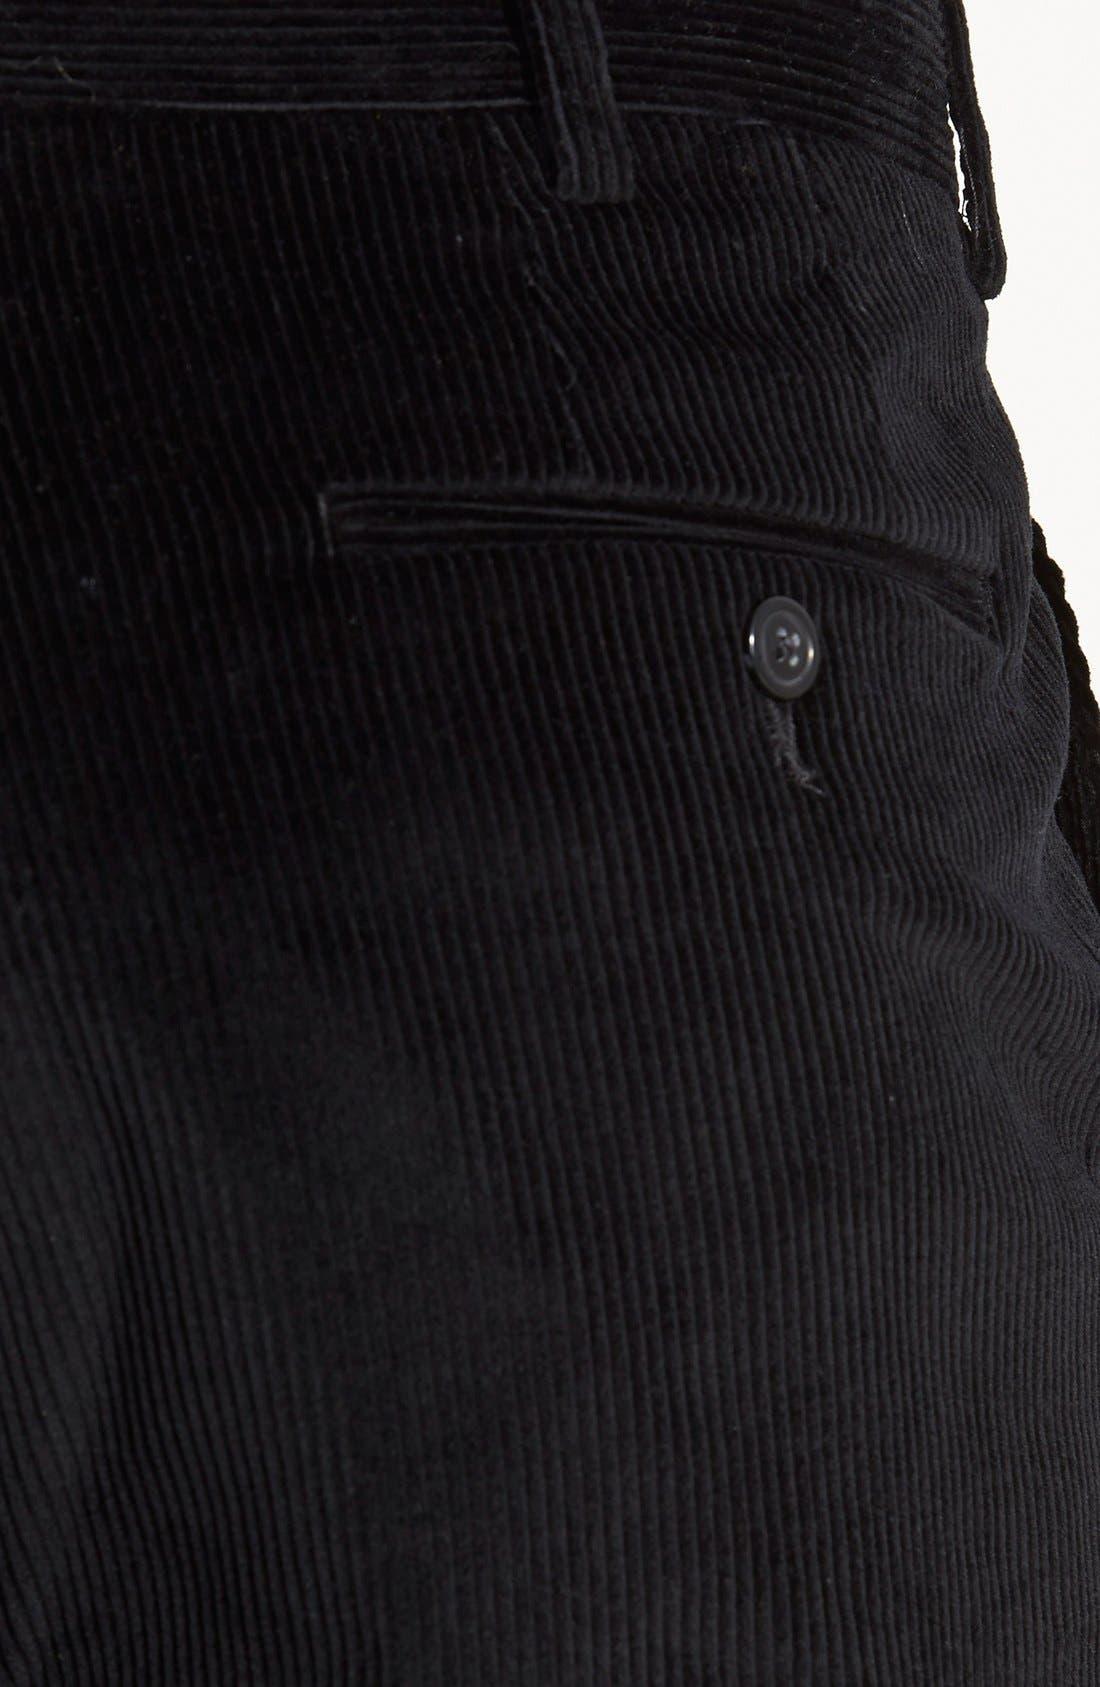 Flat Front Corduroy Trousers,                             Alternate thumbnail 3, color,                             Black